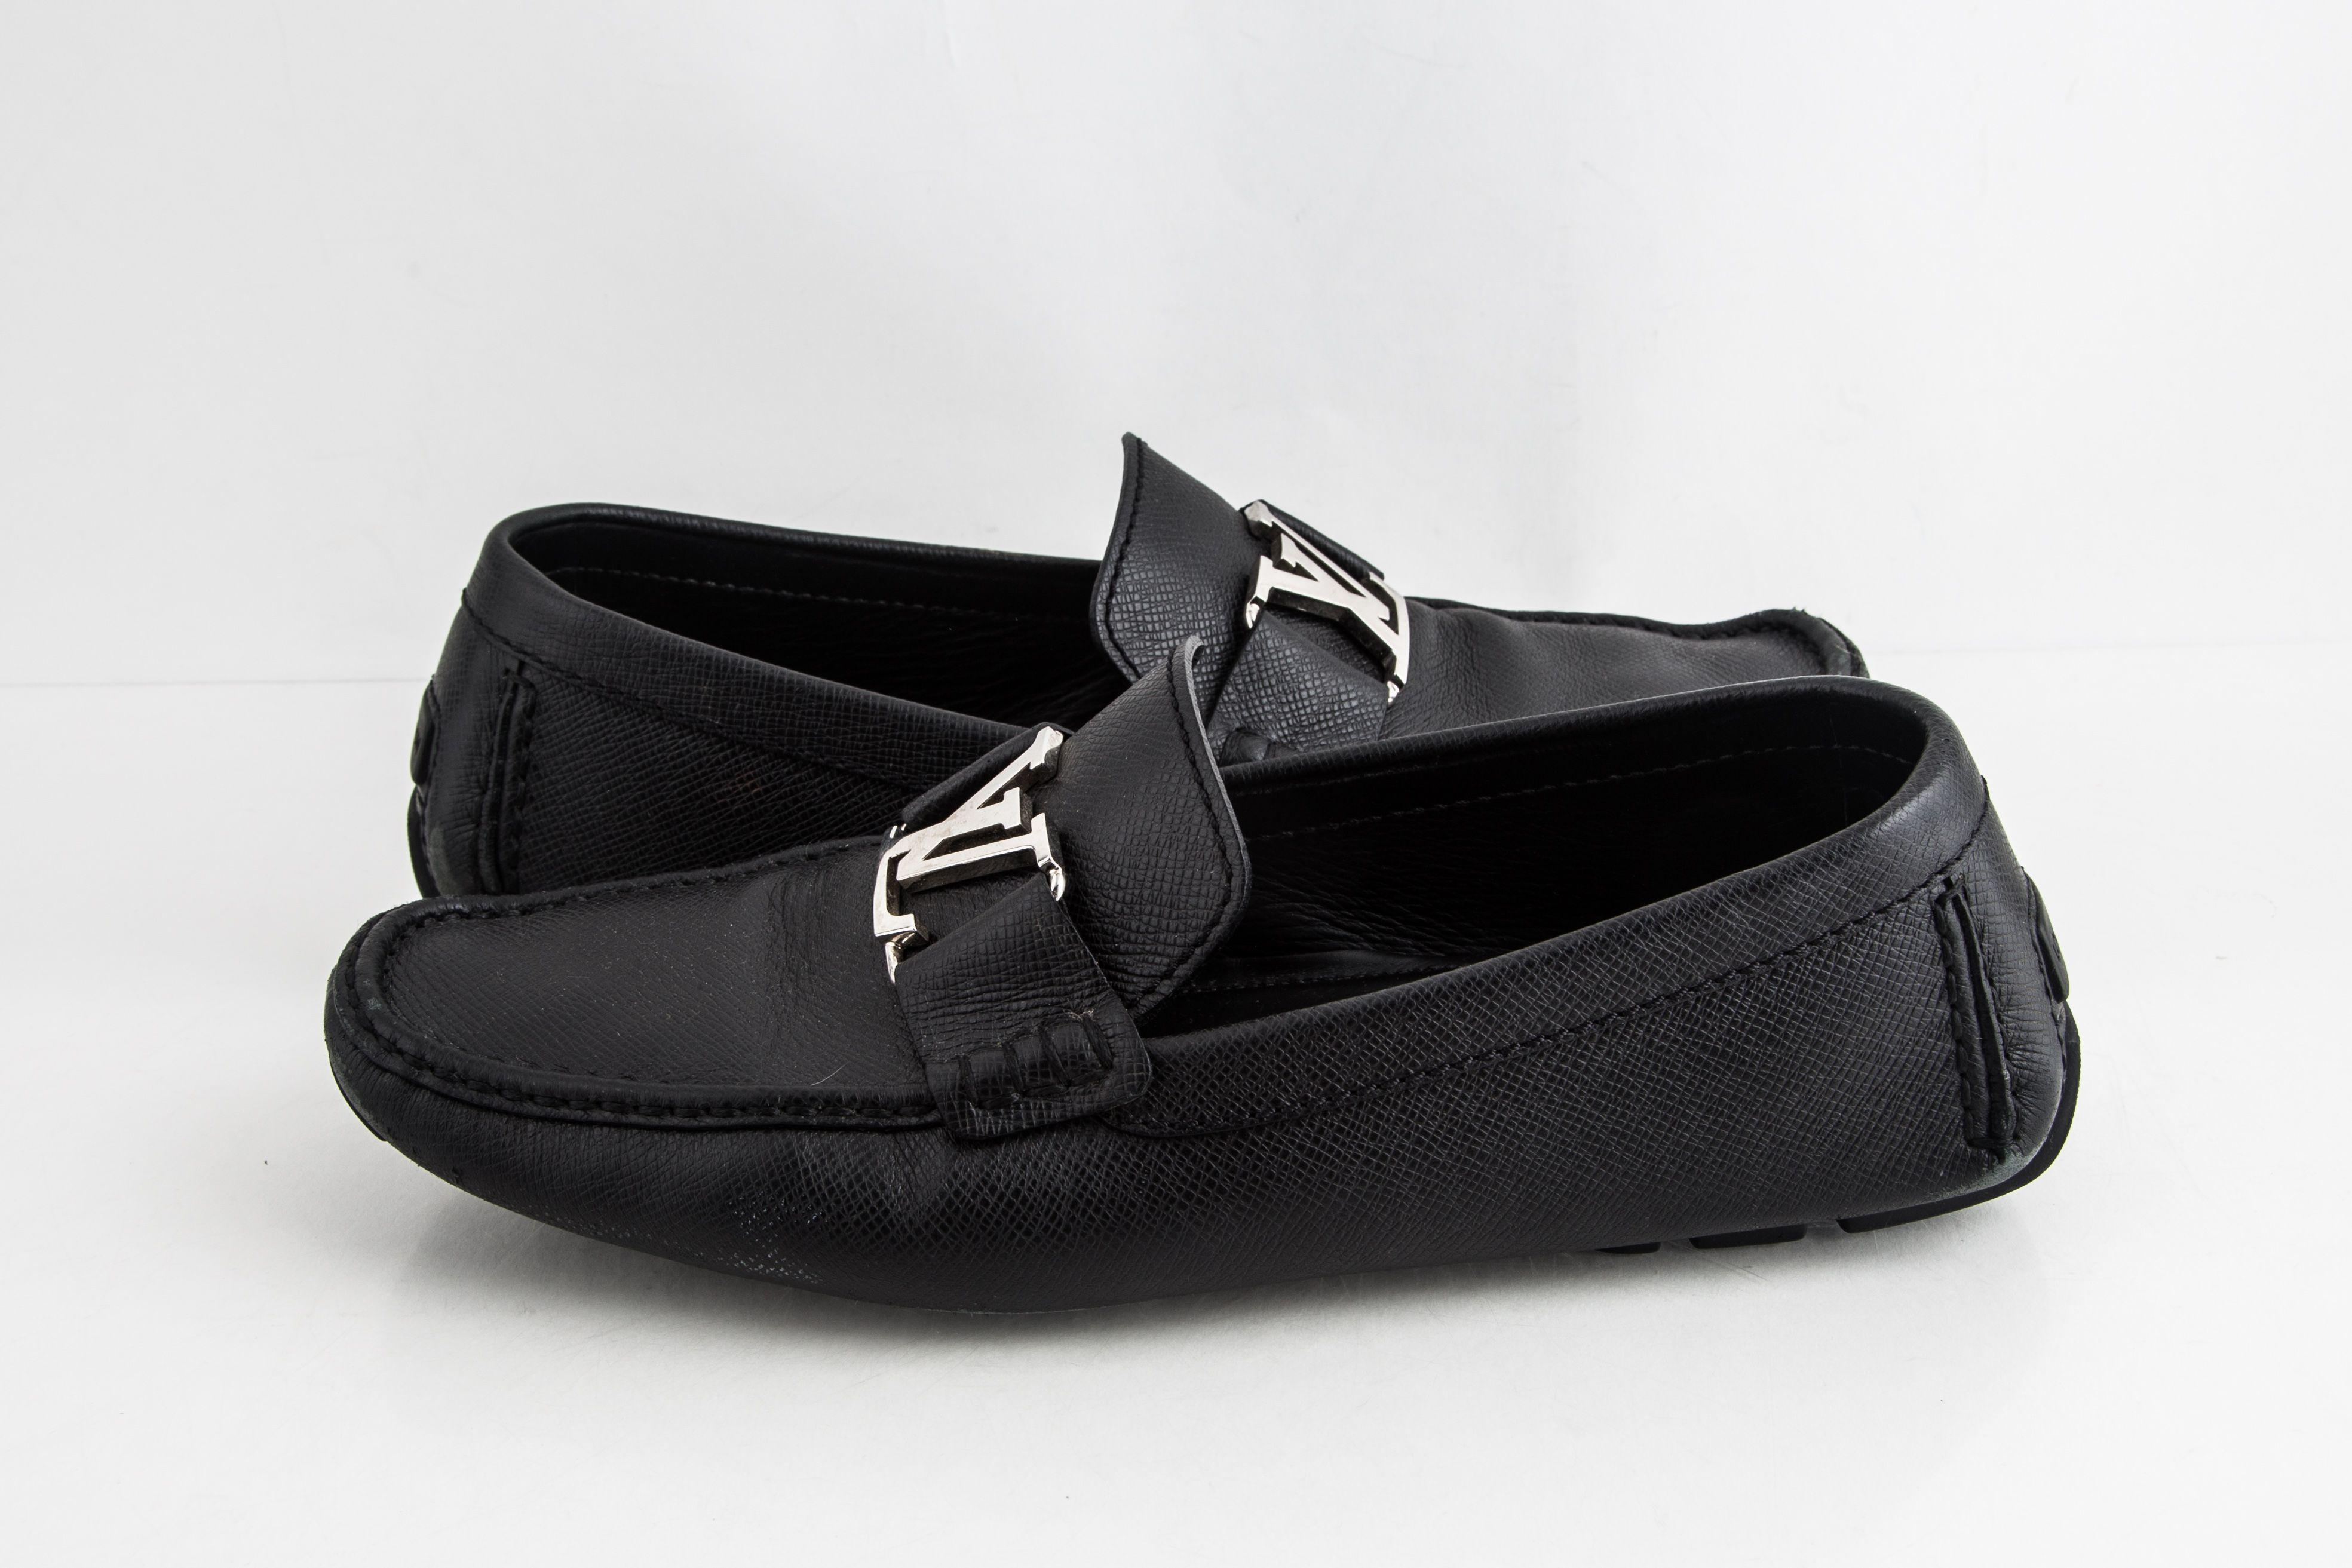 Louis Vuitton Monte Carlo Moccasin Noir